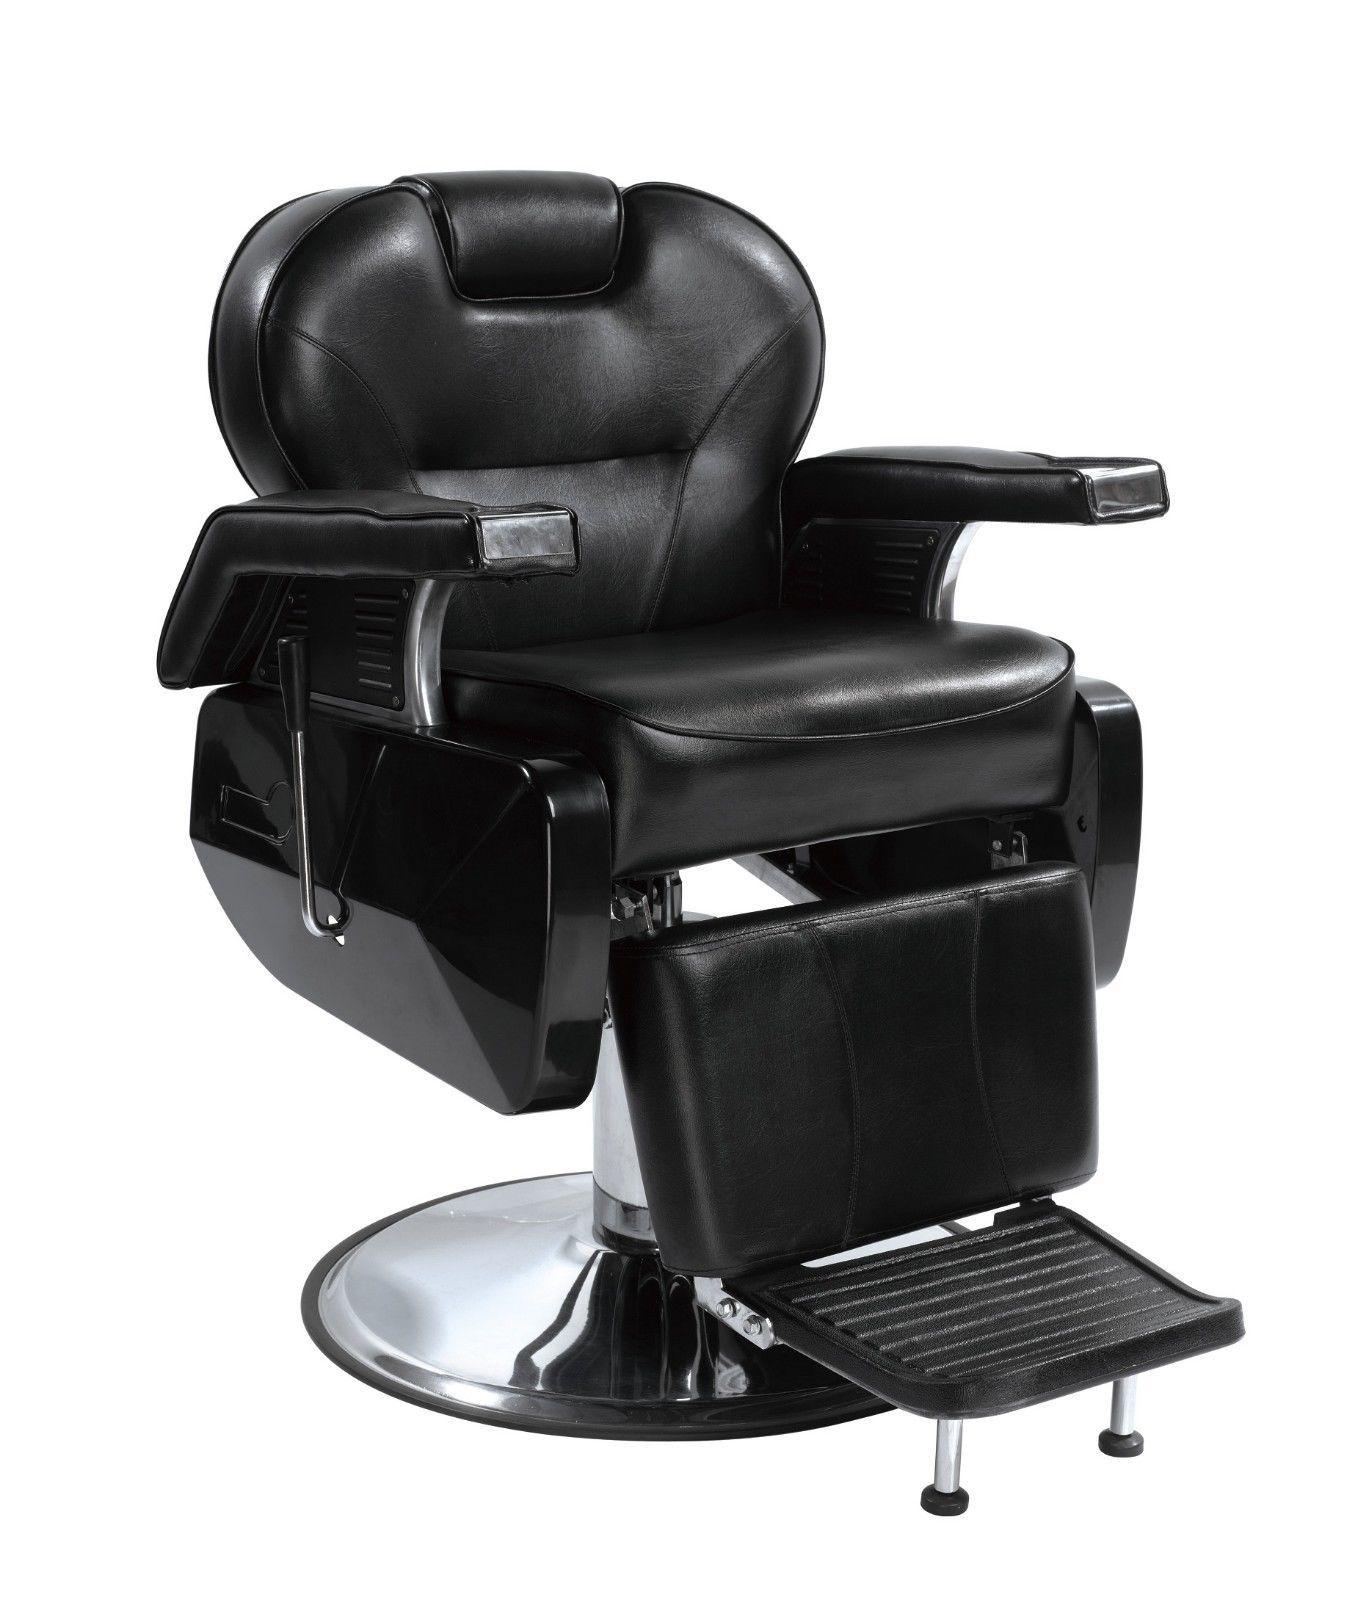 hydraulic tattoo chair for sale